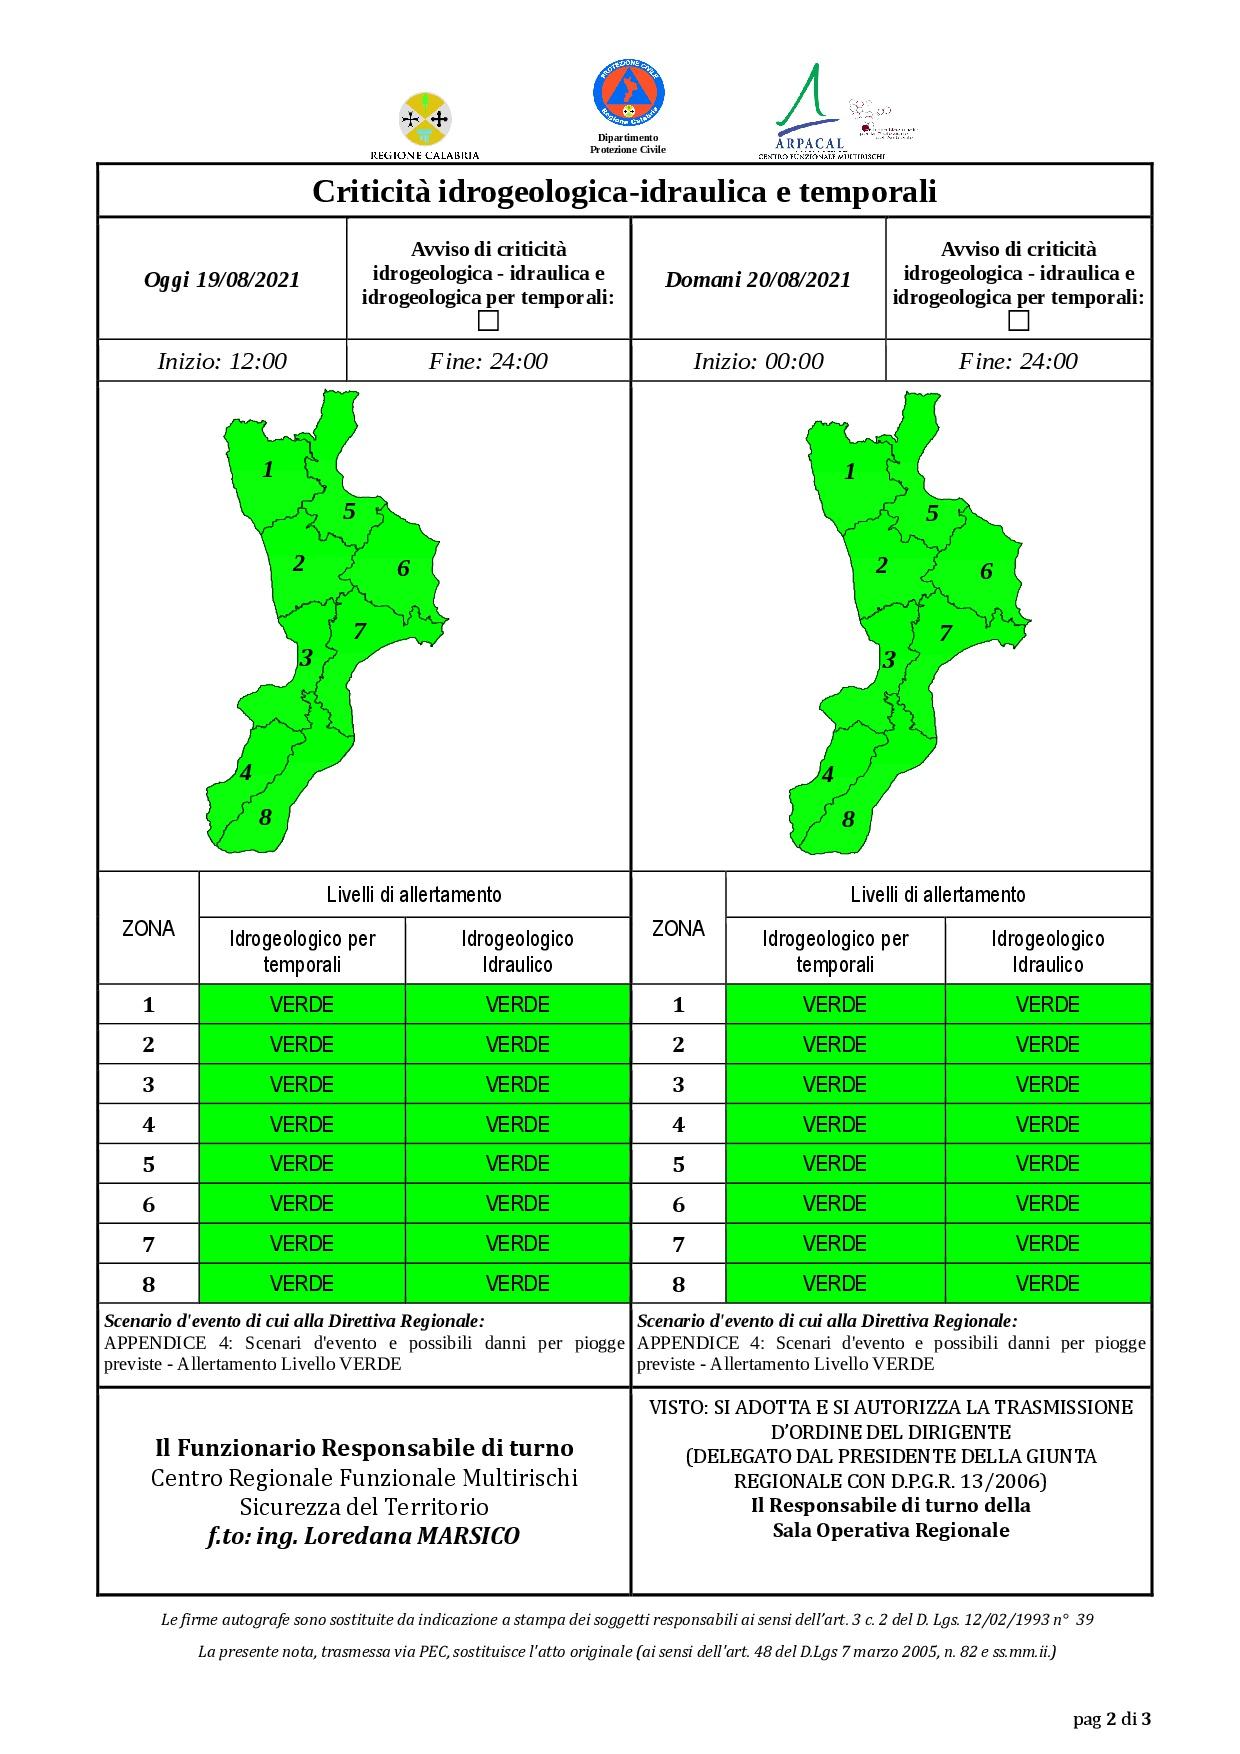 Criticità idrogeologica-idraulica e temporali in Calabria 19-08-2021